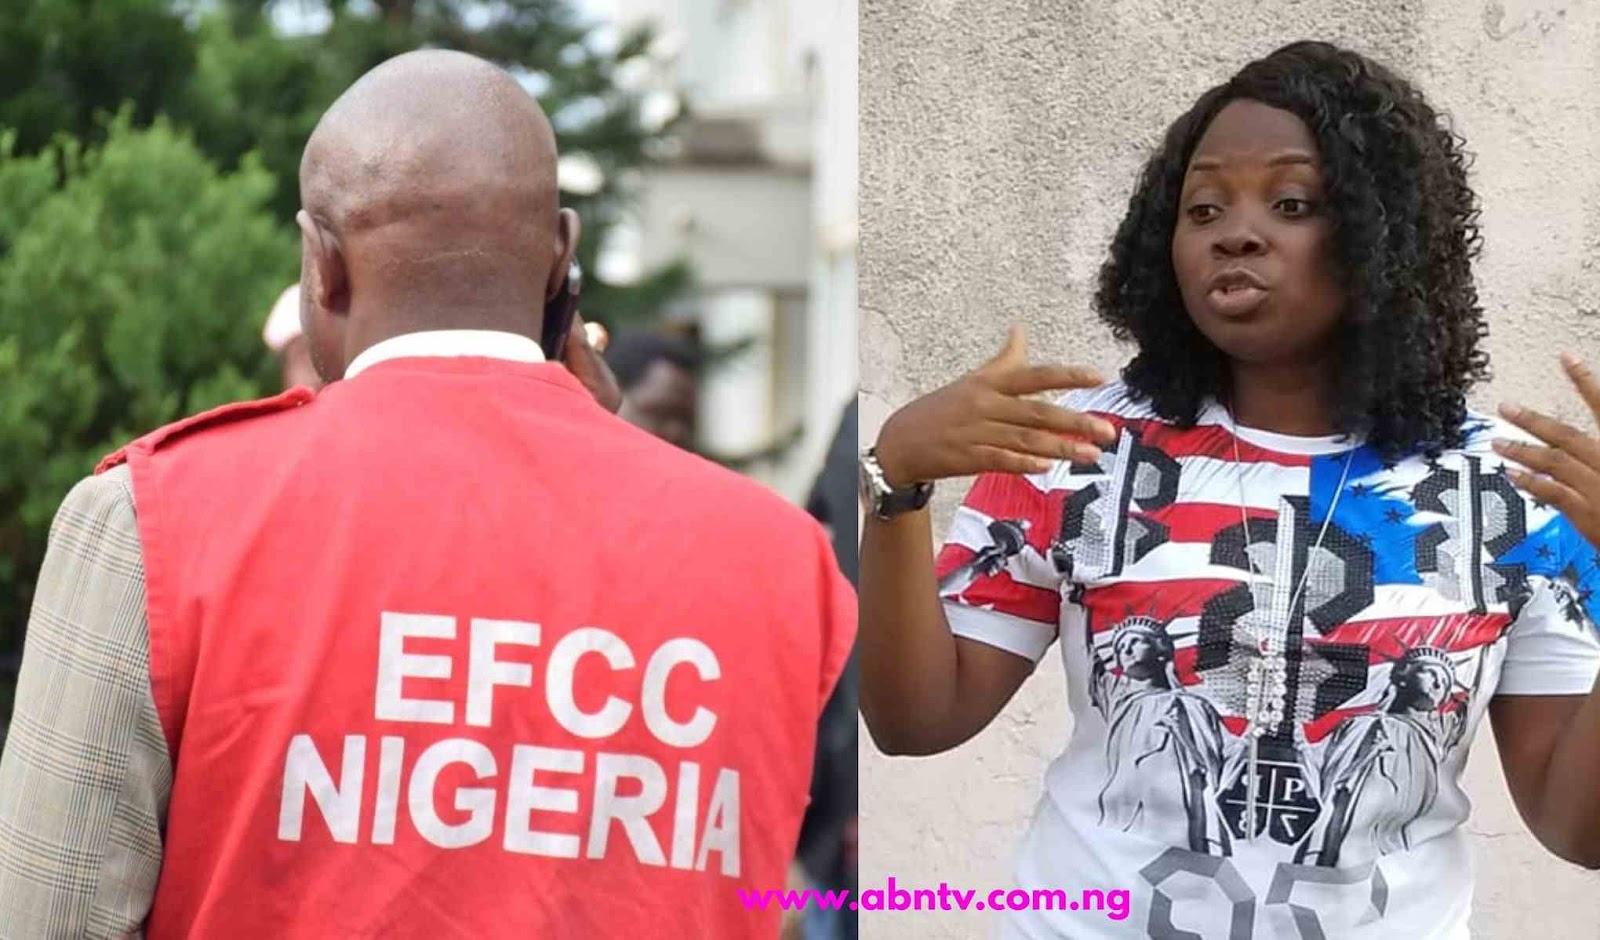 Norah Okafor Sues EFCC, Demands N20m Compensation Over Home Invasion